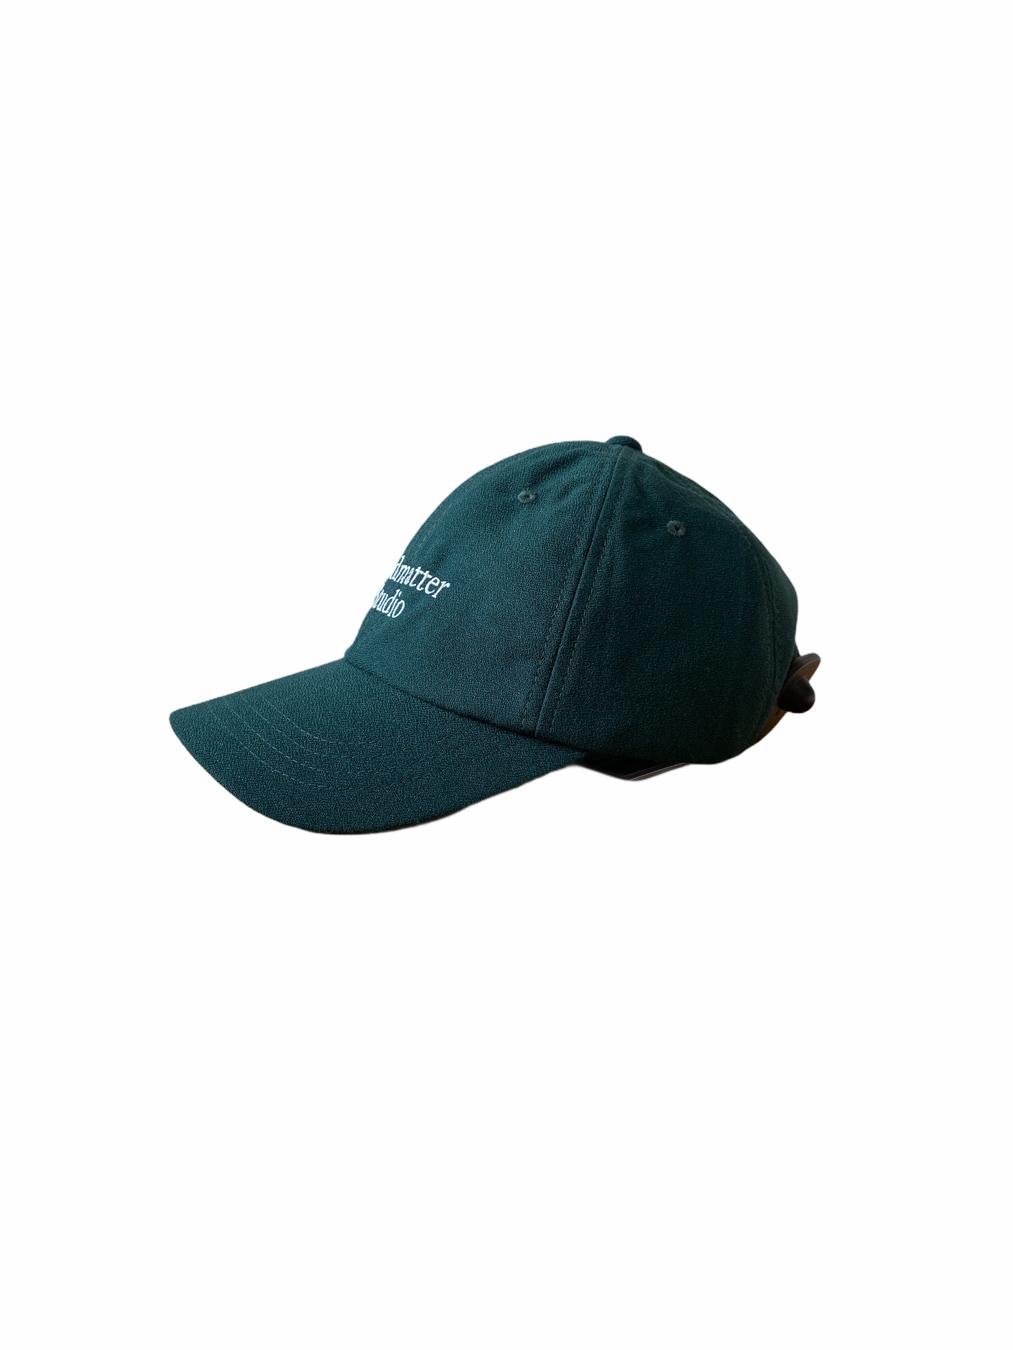 Six Nature Cap  (Dark Green)